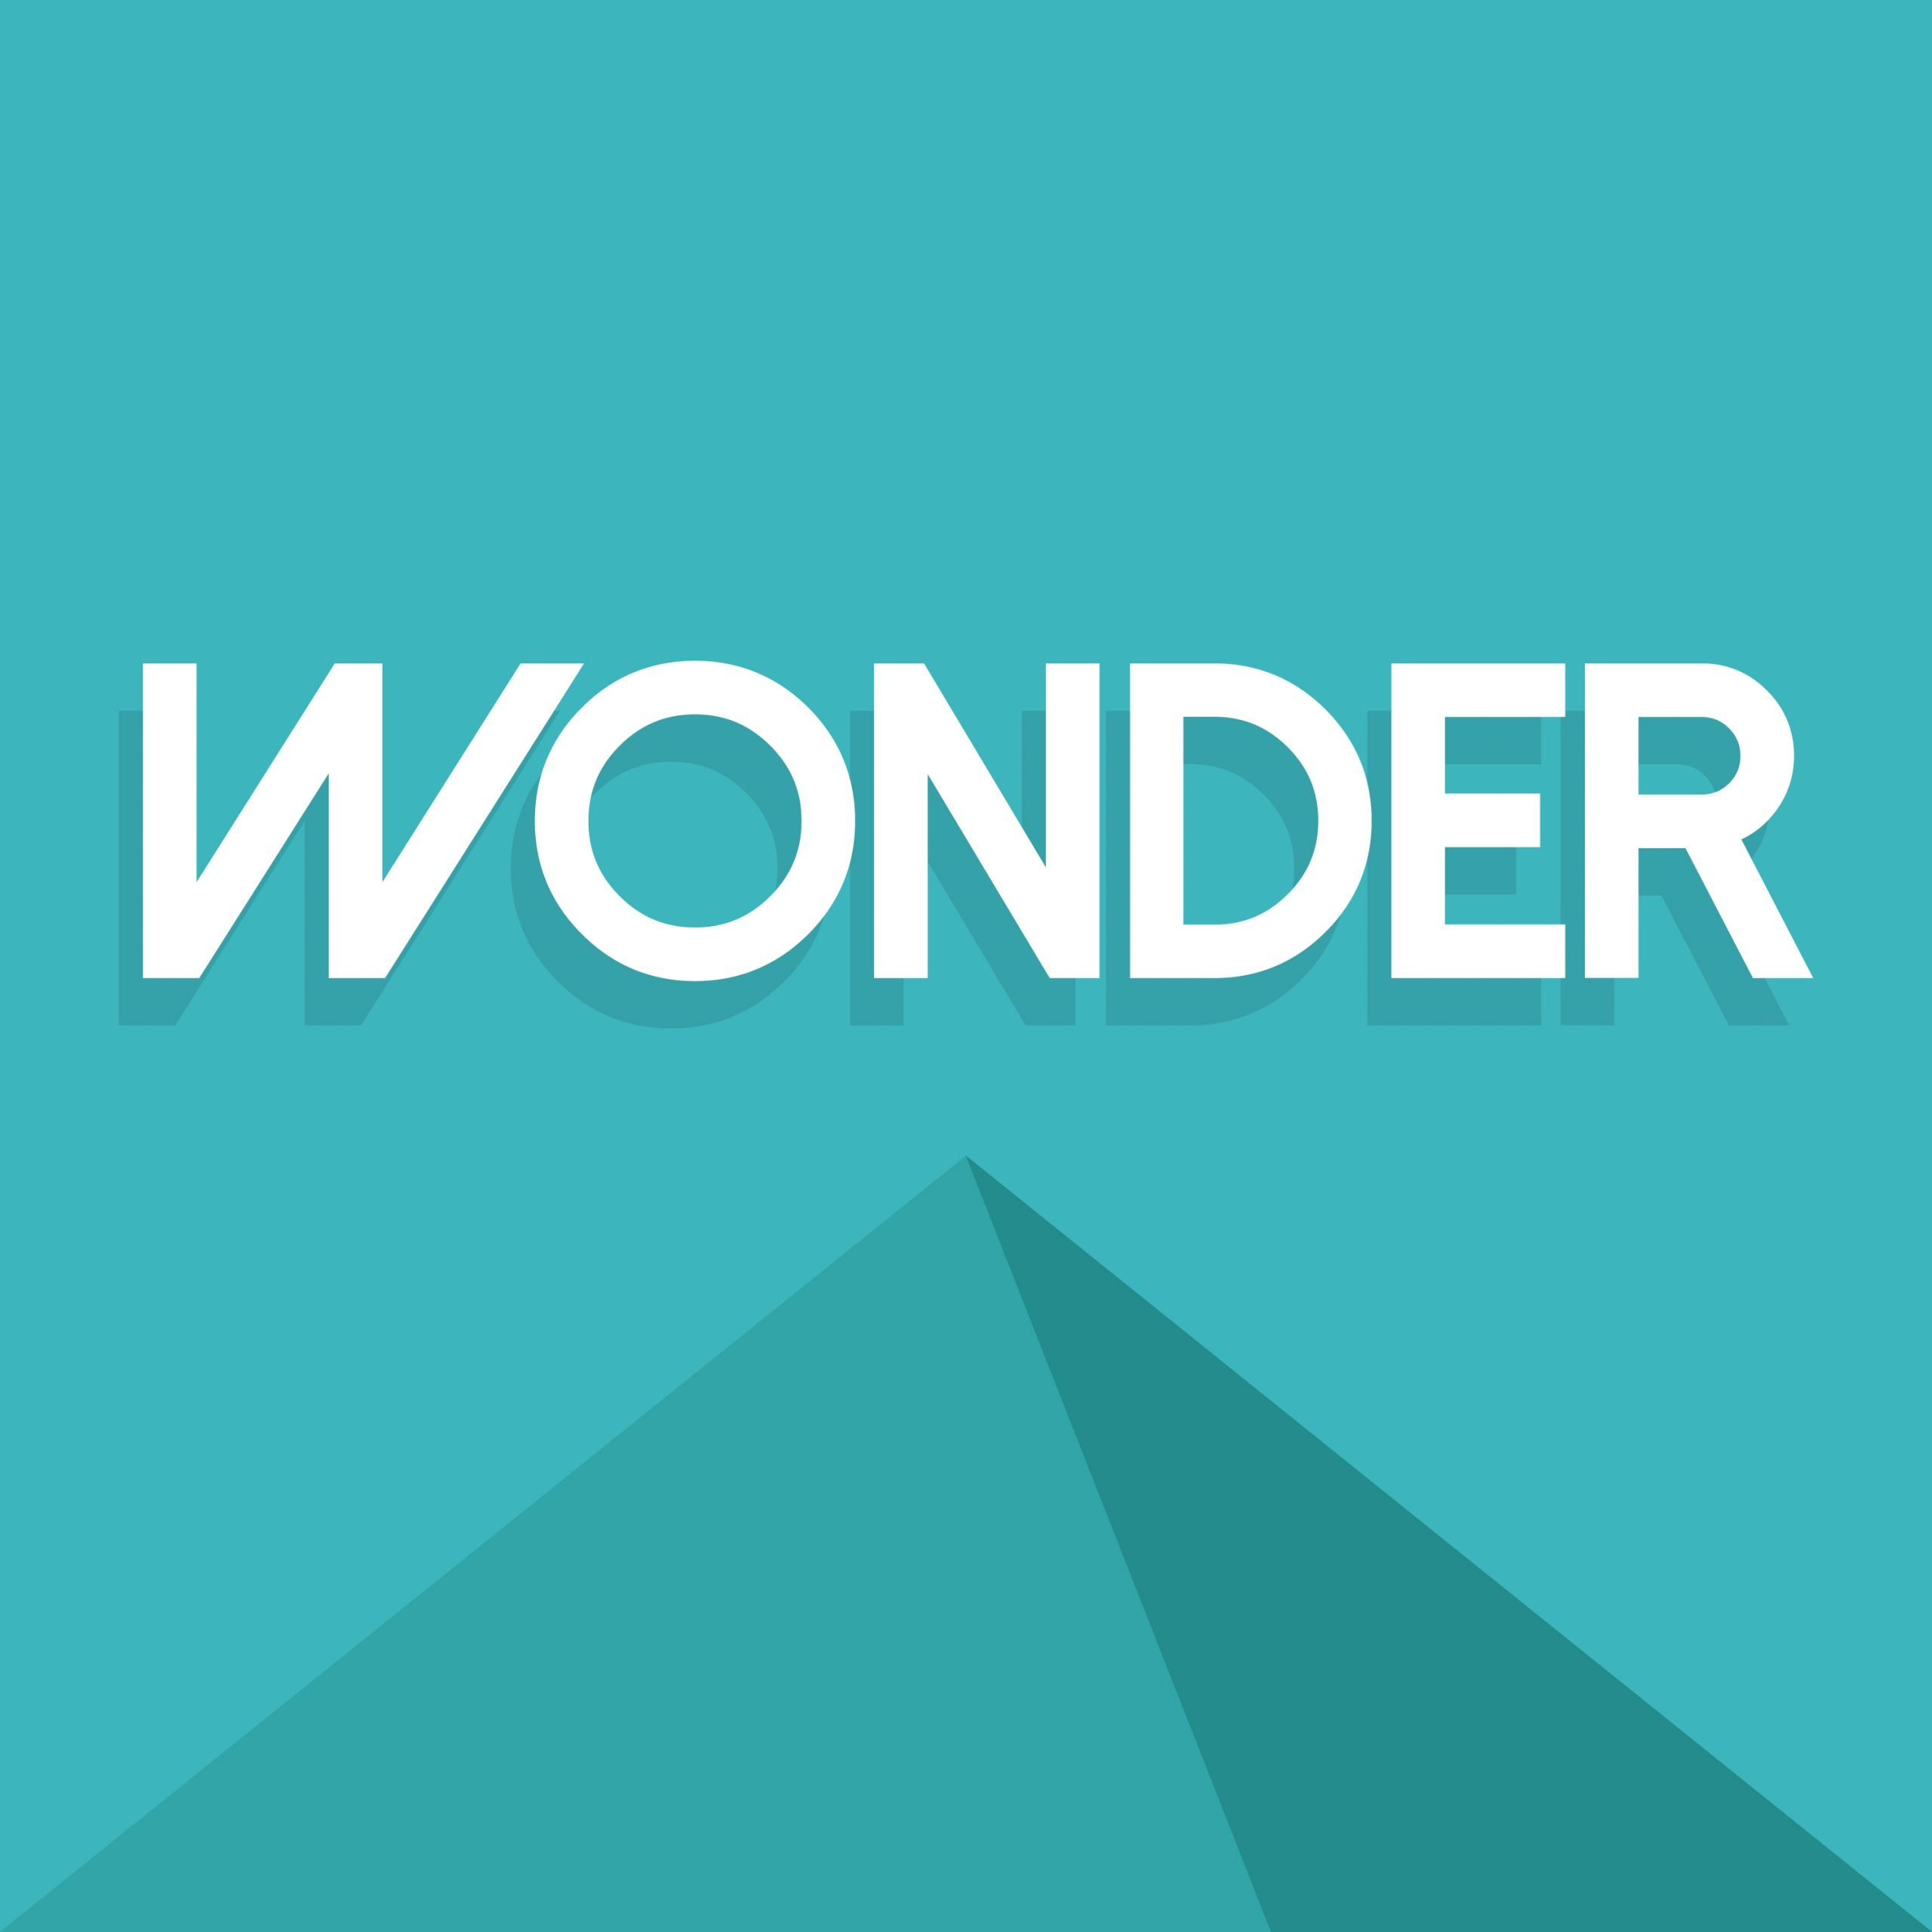 Podcast - Wonder